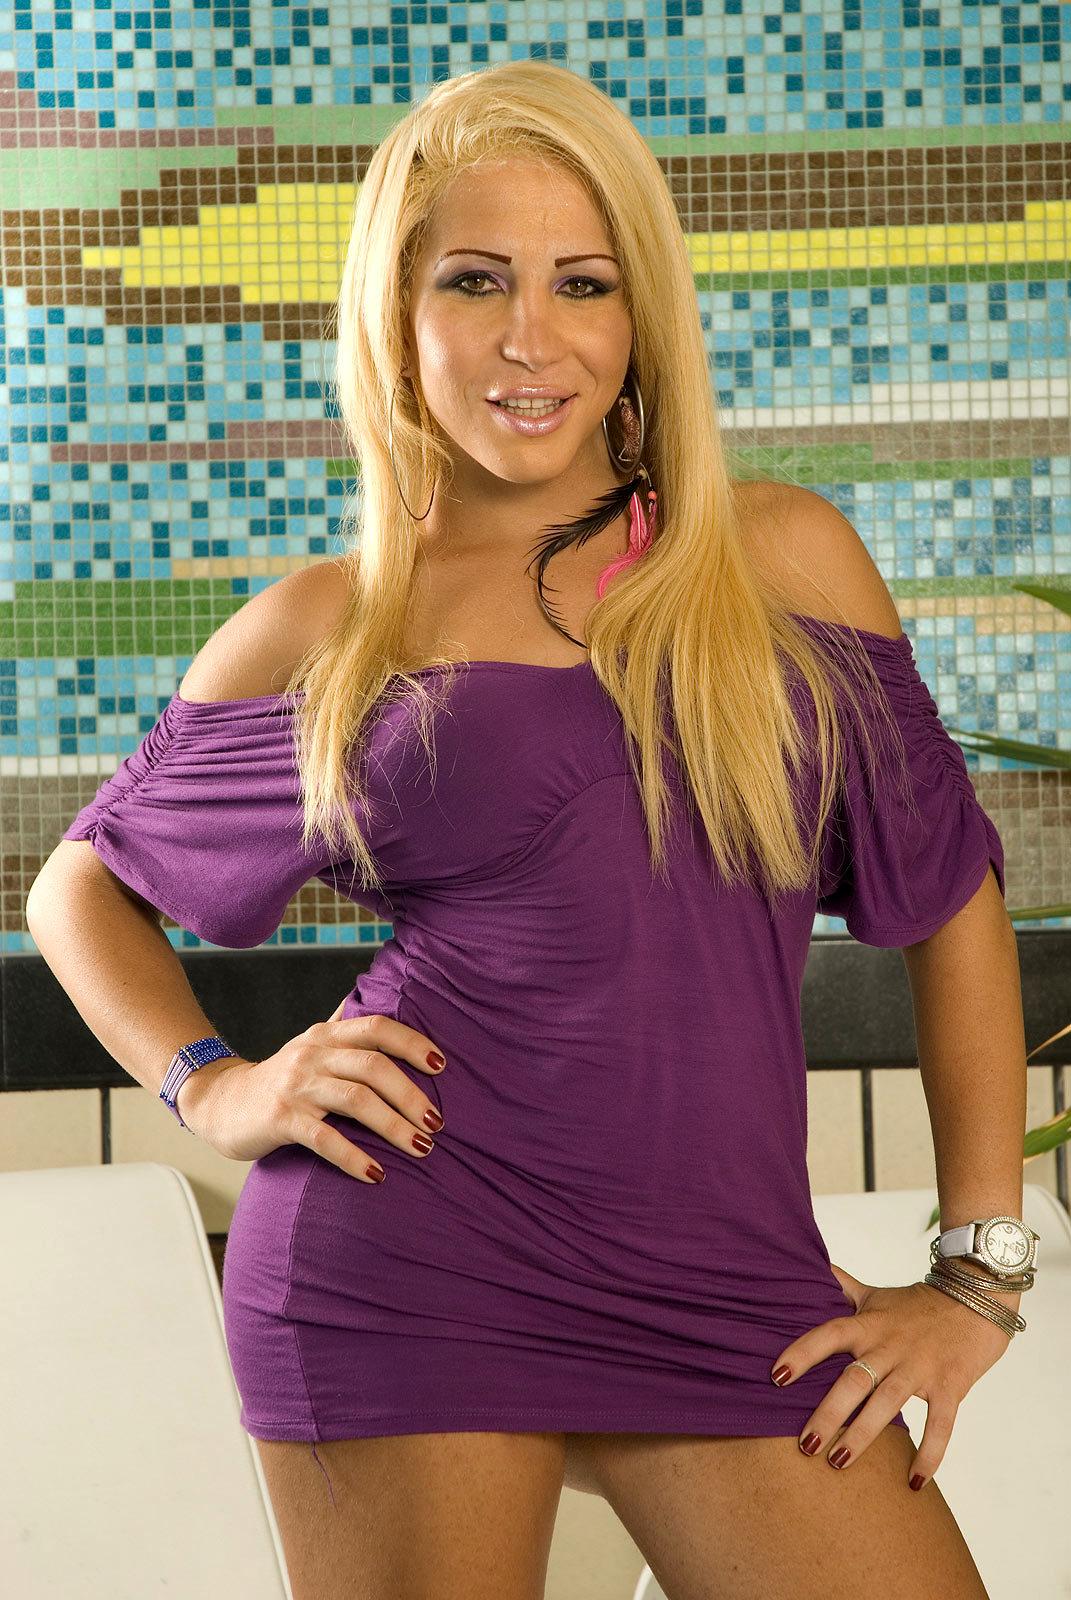 Arousing Blonde TGirl Kyara Dias Shows Us Off Massive Breasts And Penis